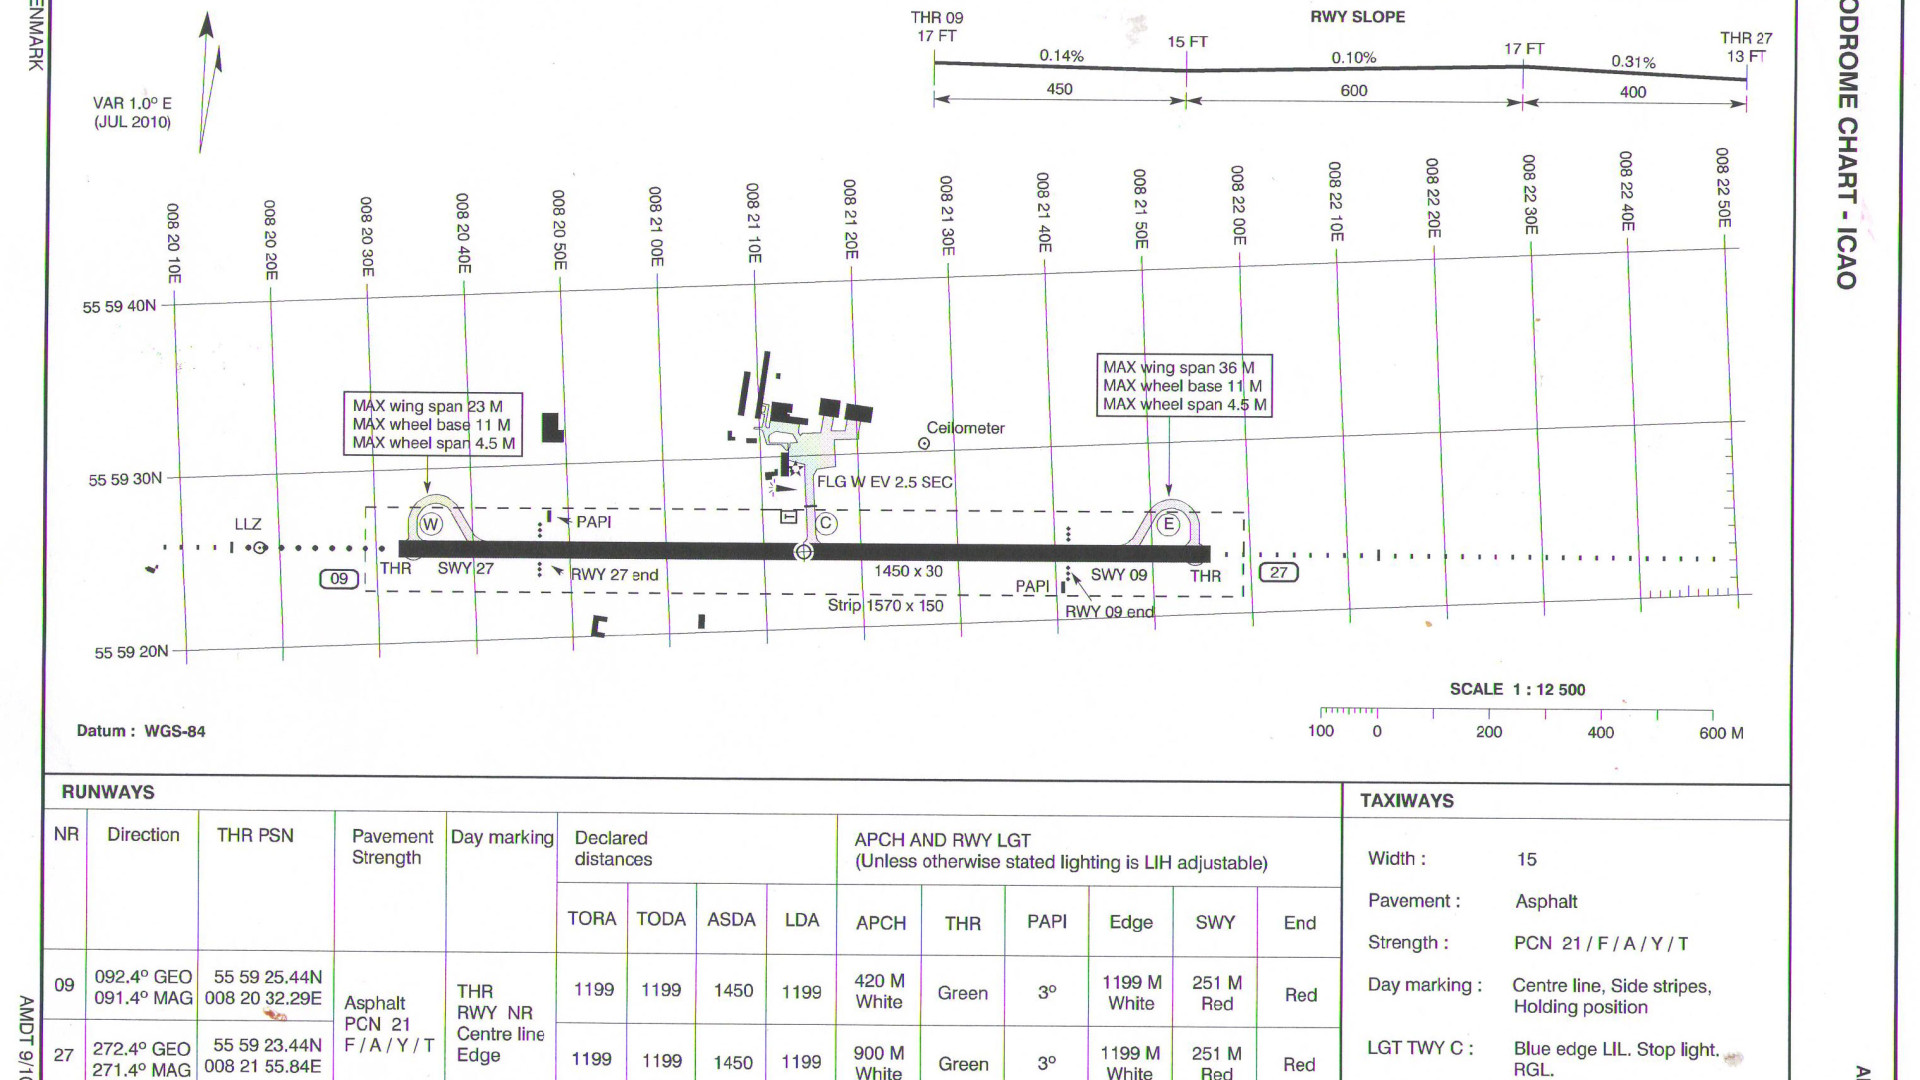 aerodrome-chart